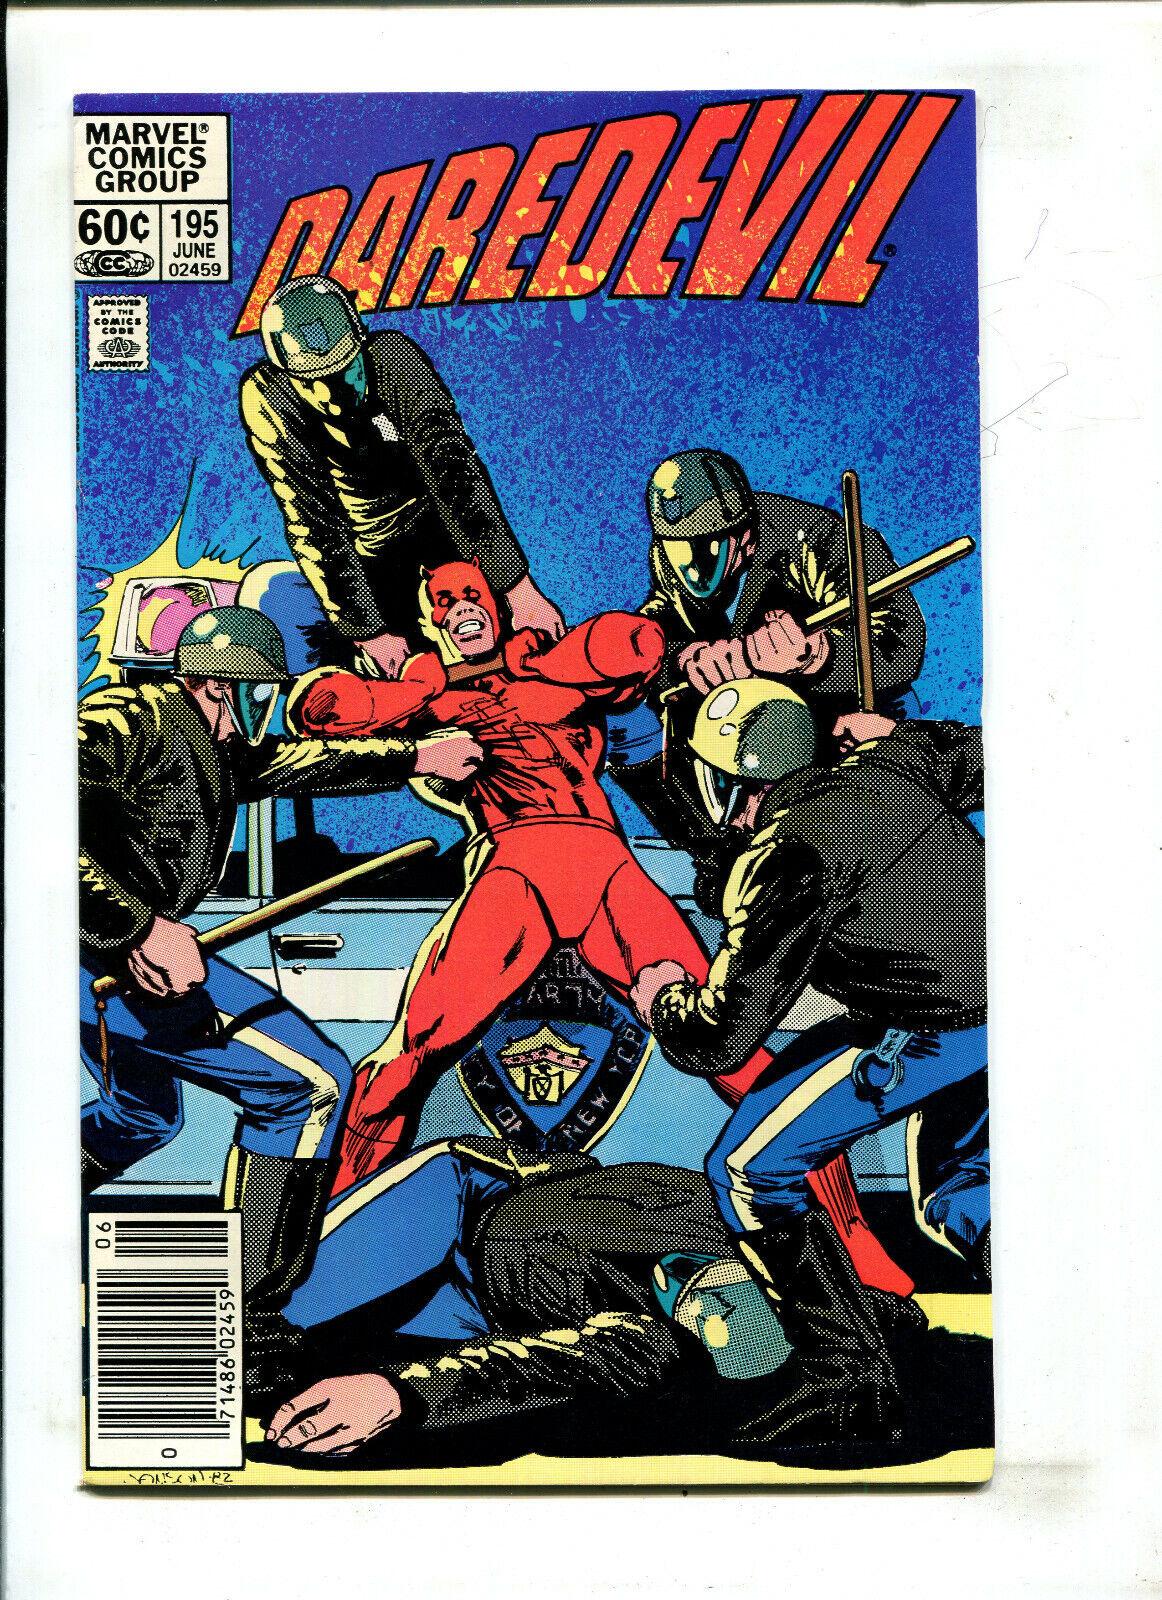 DAREDEVIL 195 NEWSSTAND - BETRAYAL 9.2 1983 - $19.70